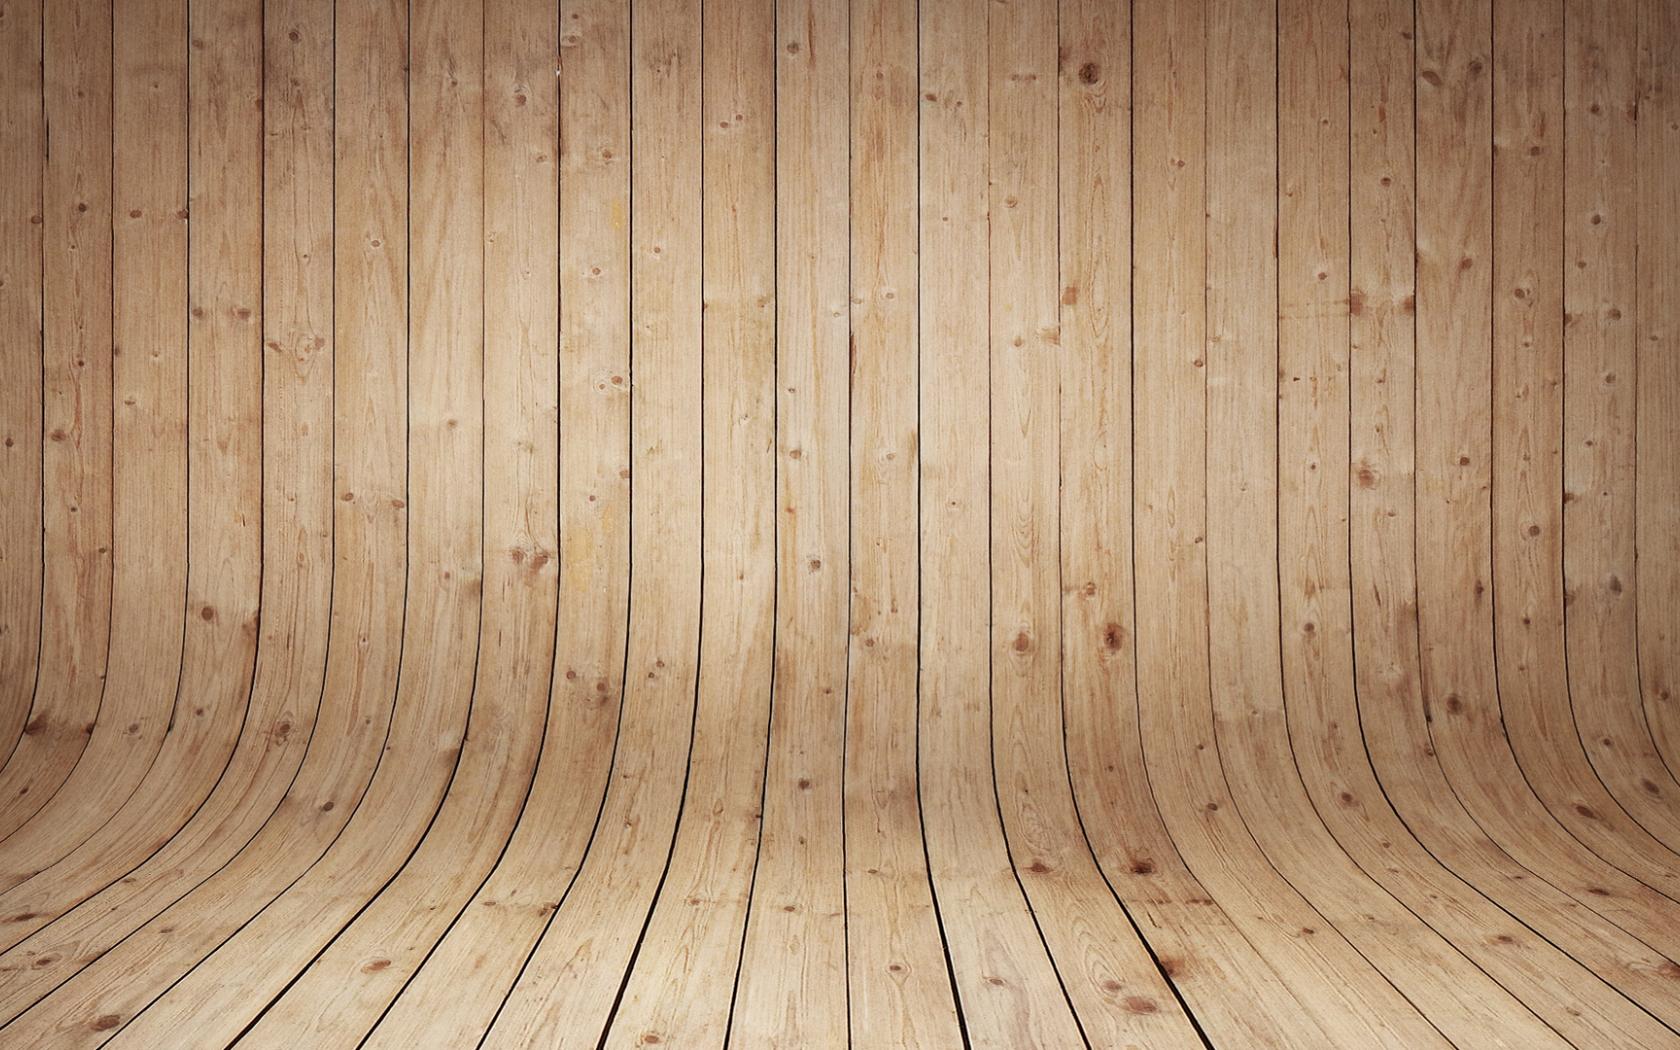 Free download Desktop Wood Wallpaper HD